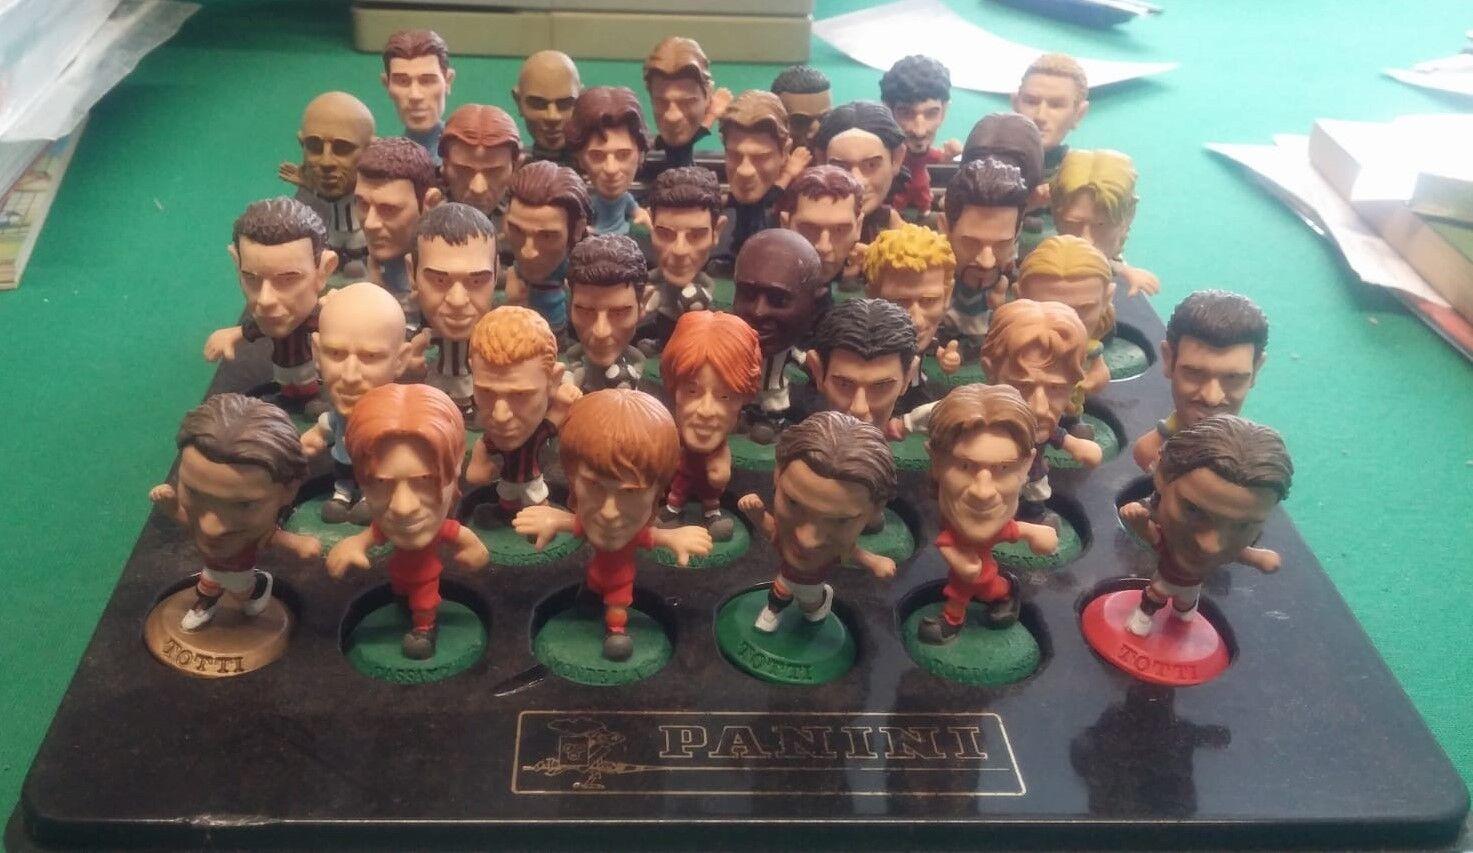 Mega Lot Corinthian Headliners footballers-football Soccer-Vintage Toys